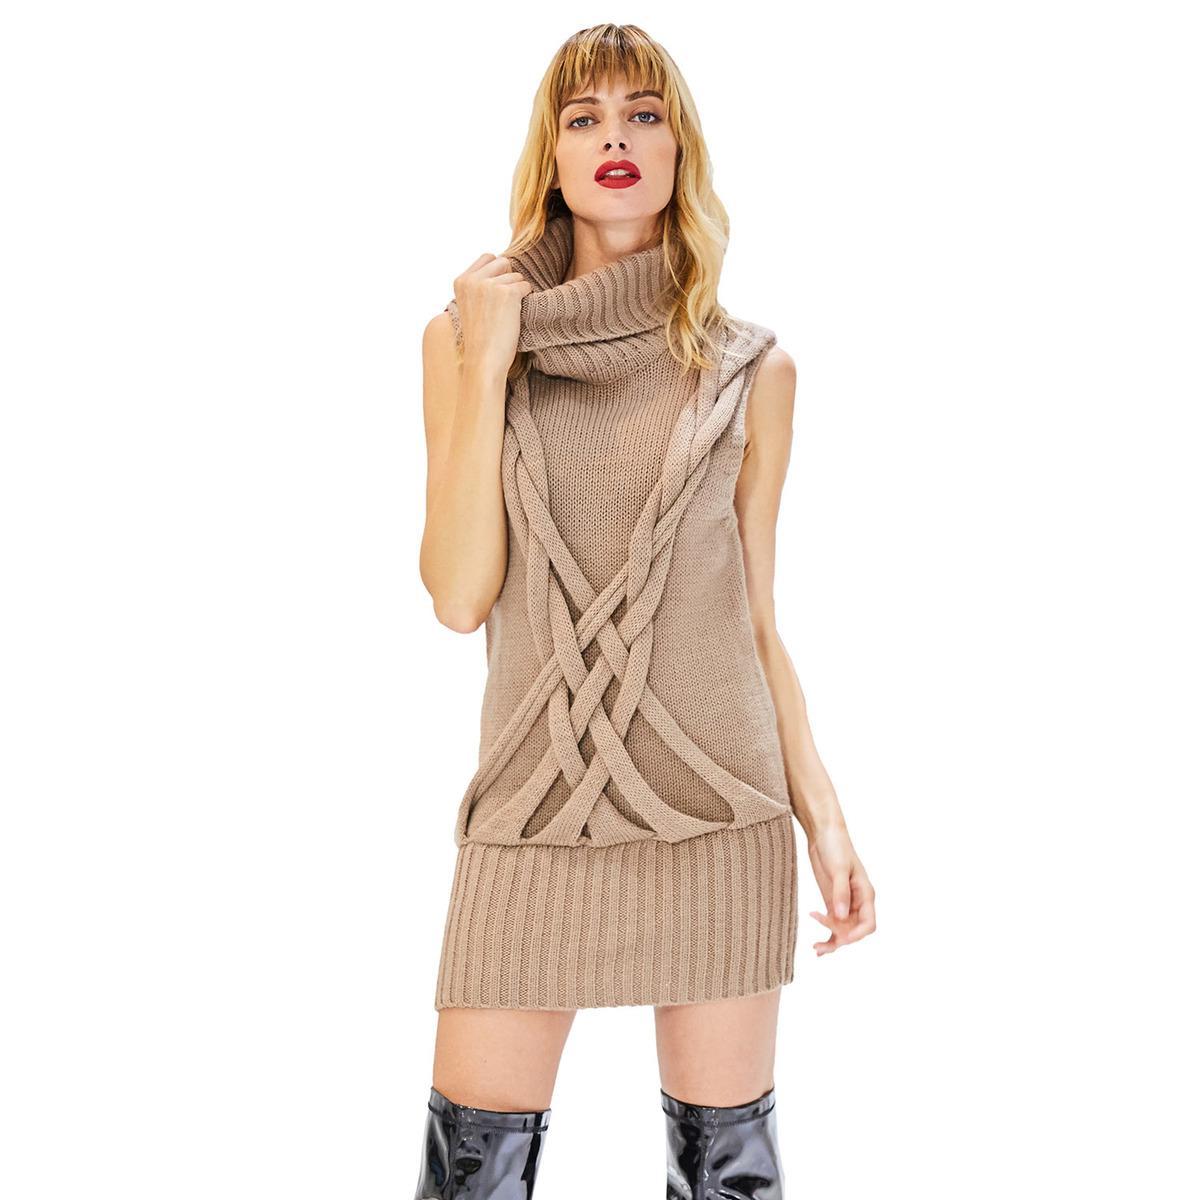 775cbdeff7e 2018 Winter Dresses Women Knitted Sleeveless Turtleneck Dress Khaki Warm  Knitwear Casual Office High Neck Sweater Dress Online with  42.98 Piece on  ...